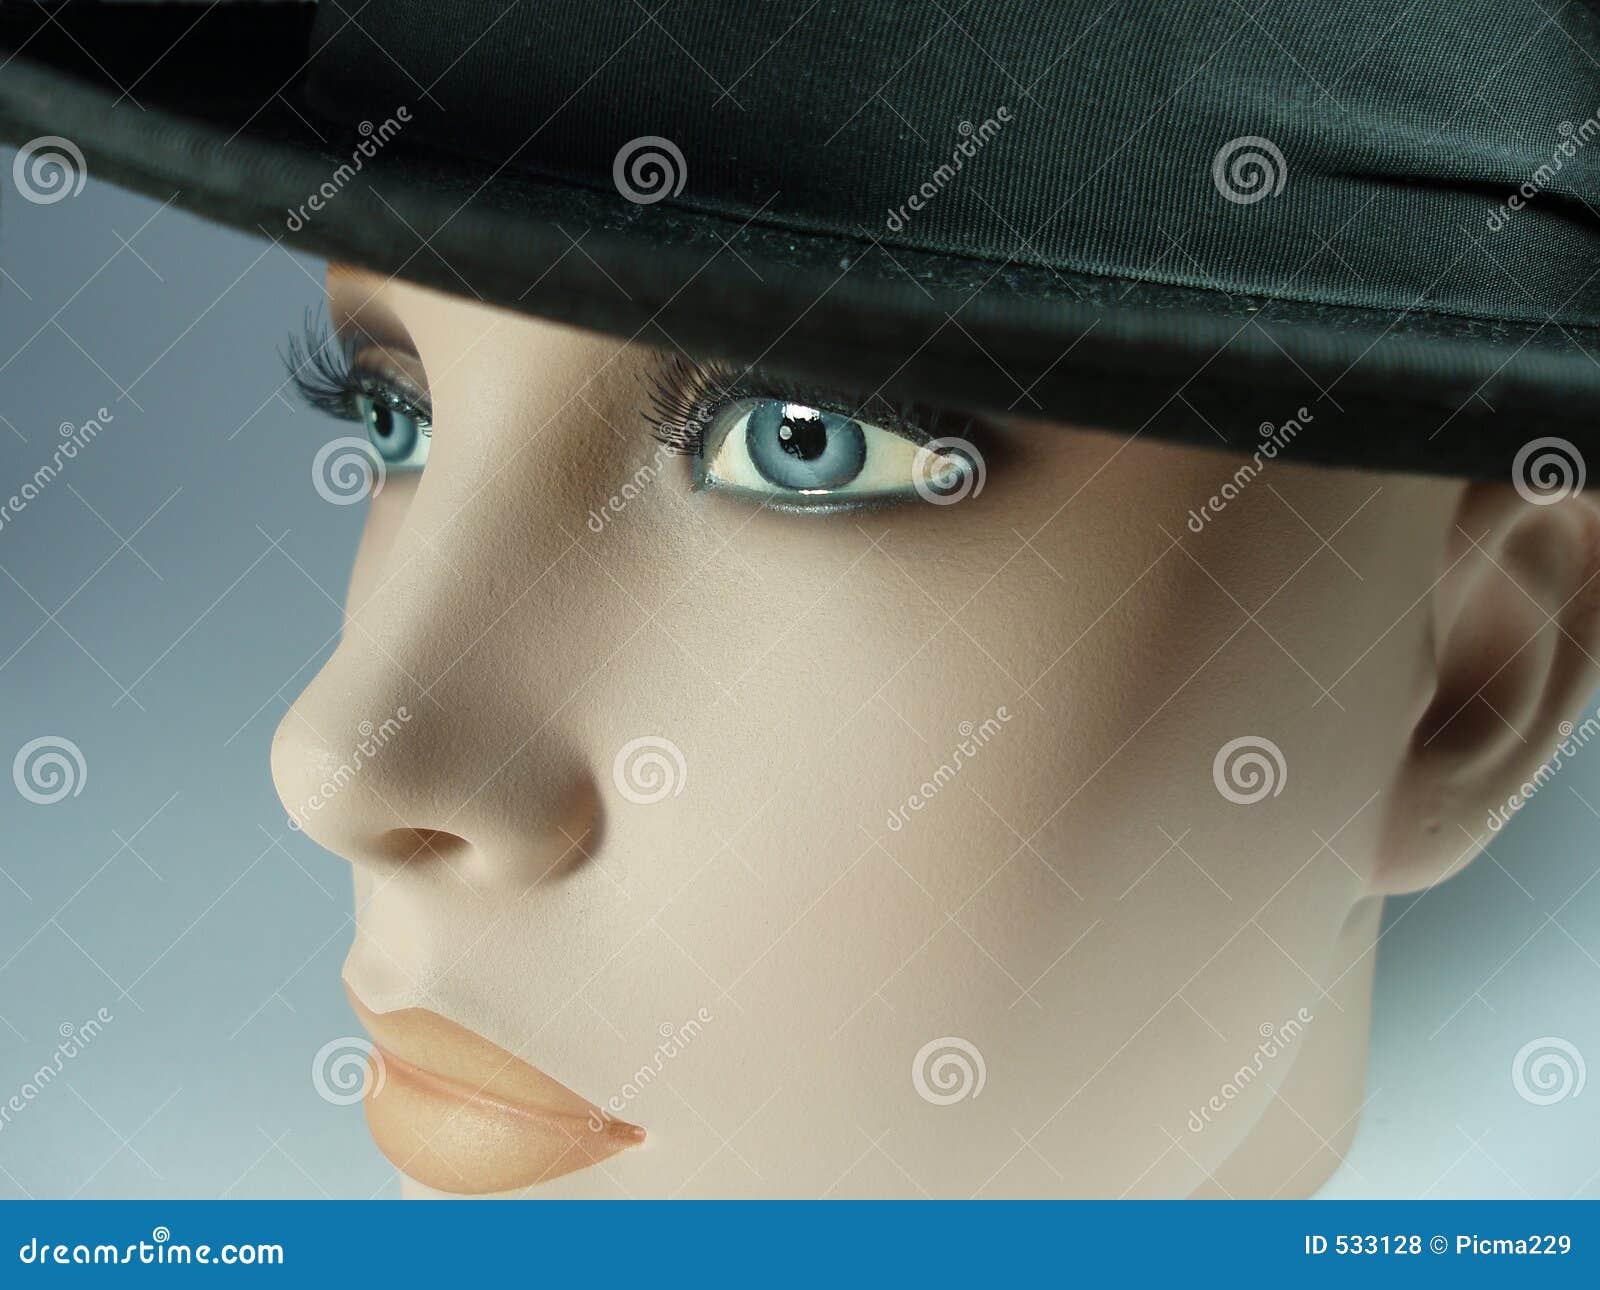 Download 1个黑色玩偶帽子 库存照片. 图片 包括有 帽子, 贵族, 皮肤, 苍白, 不动, 投反对票, 界面, 鼻子 - 533128